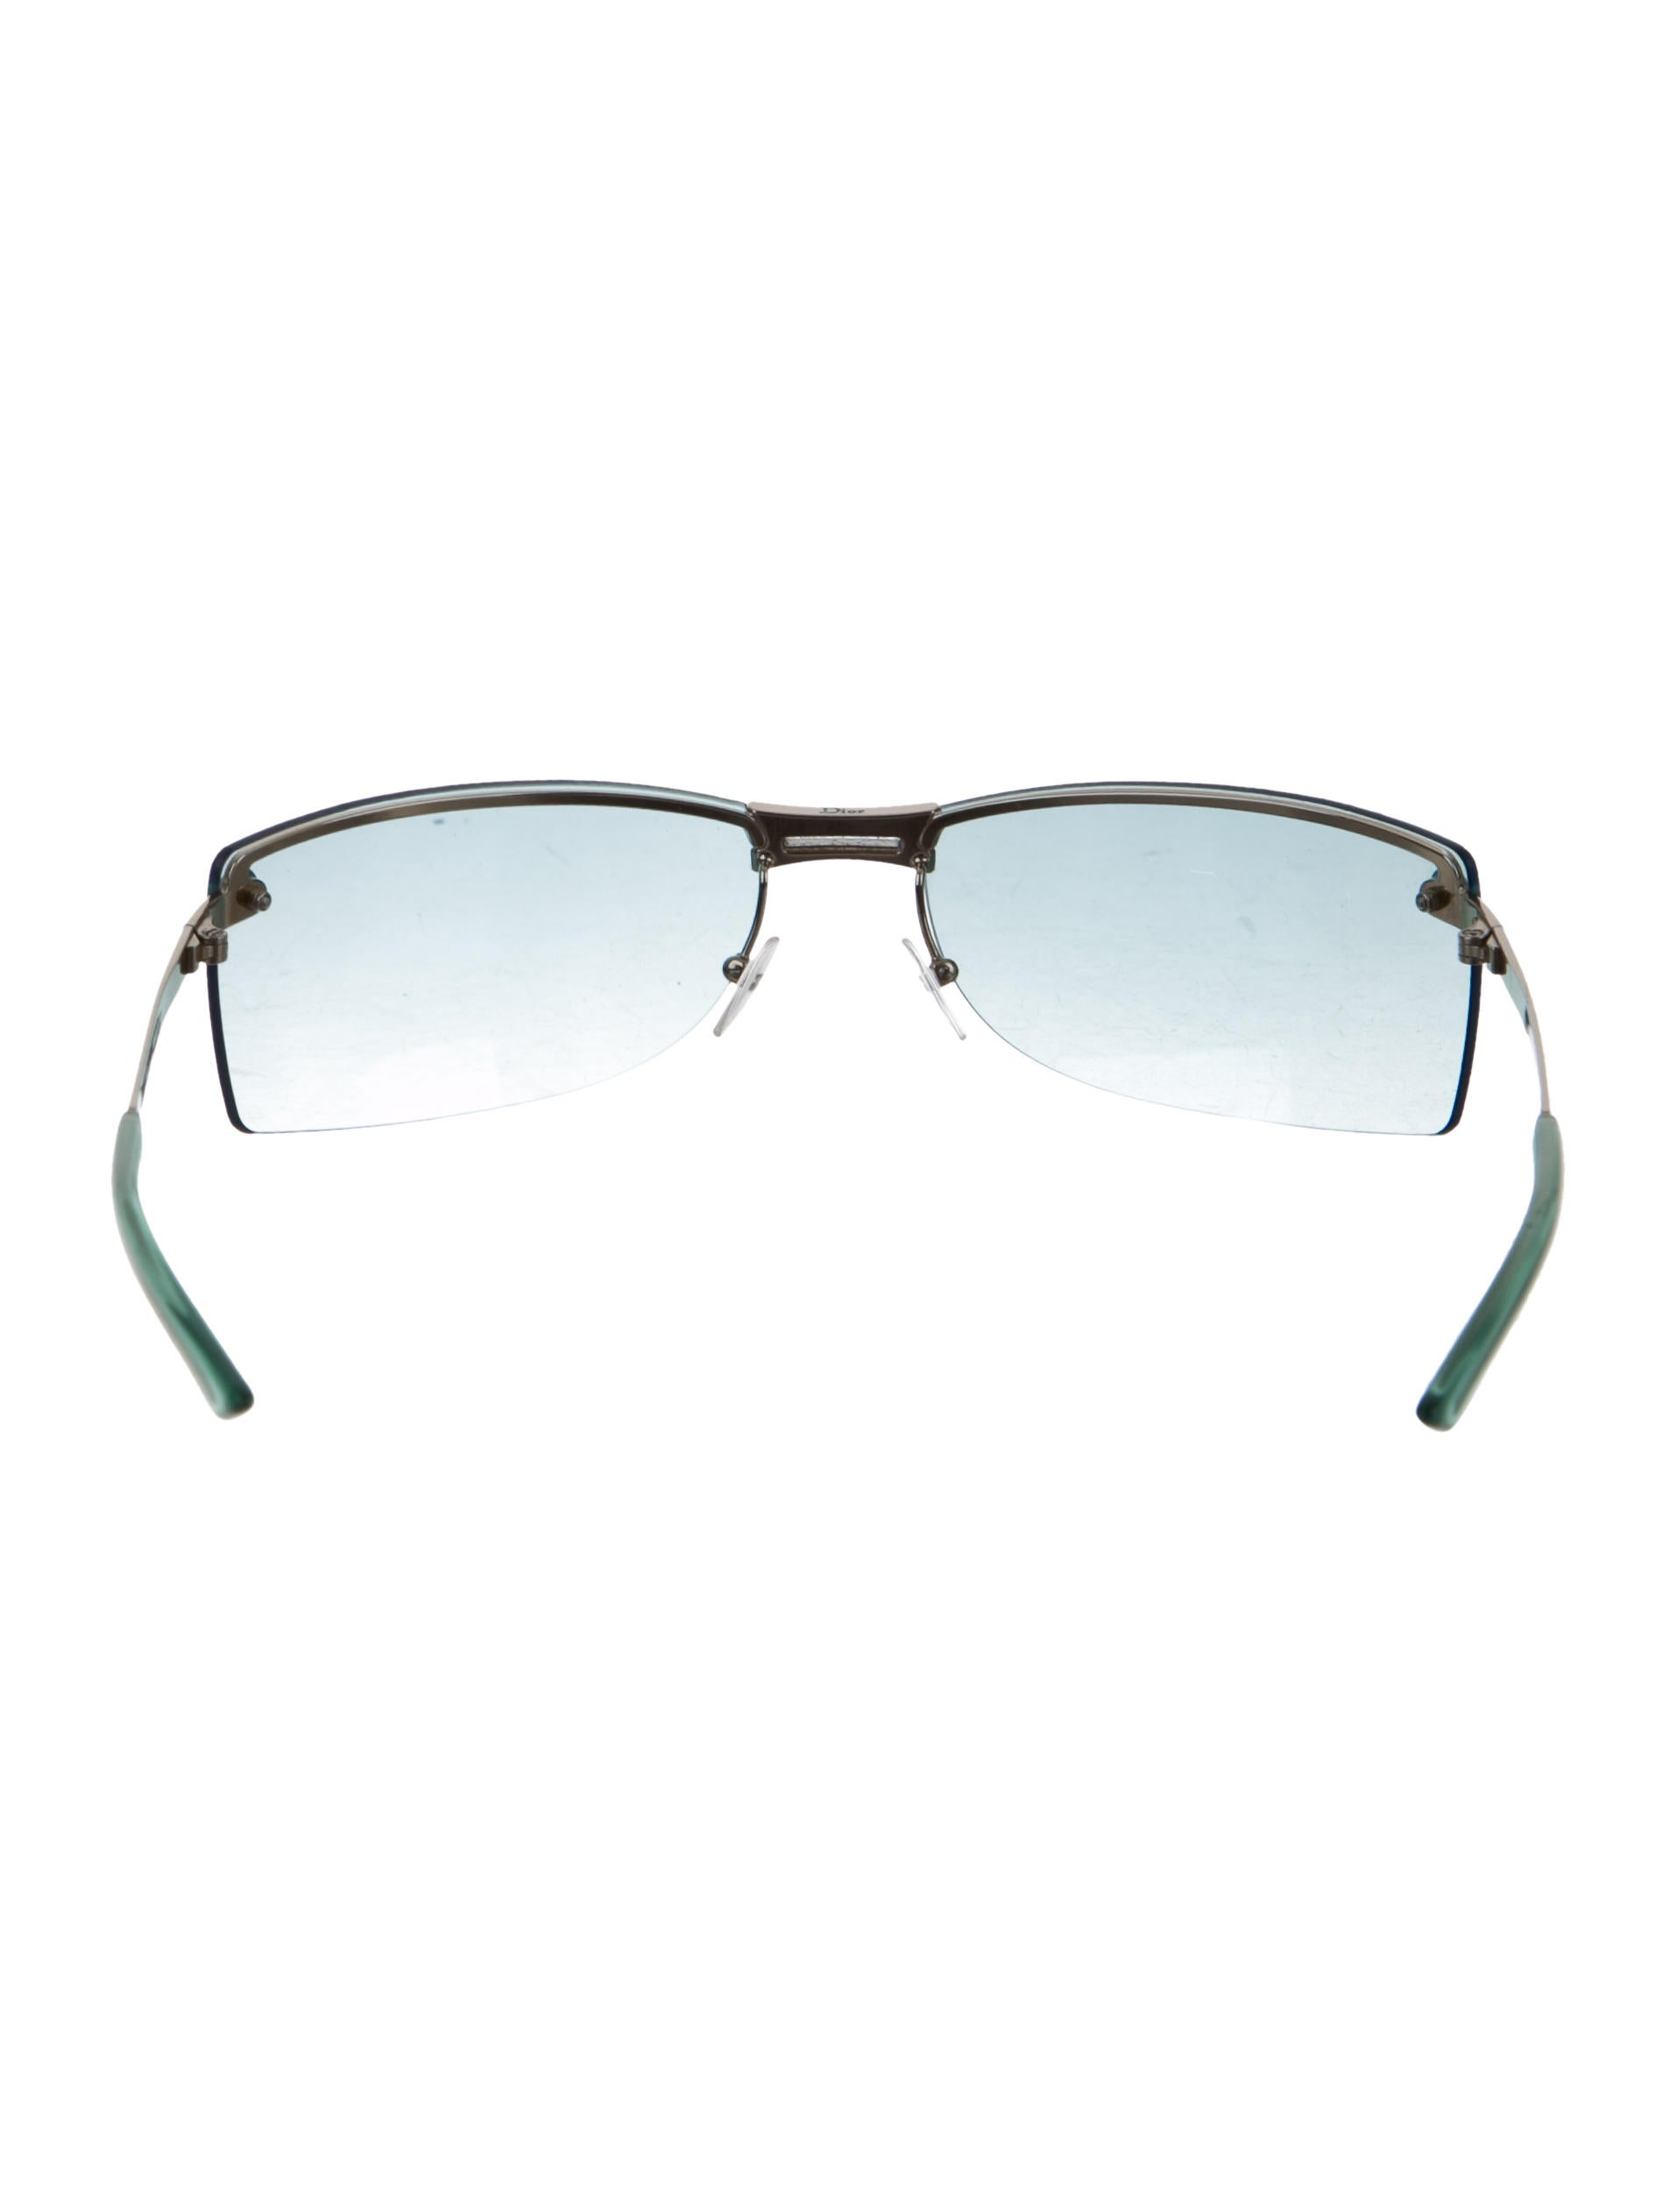 Rimless Glasses Look Good : Christian Dior Adiorable 1 Rimless Sunglasses ...